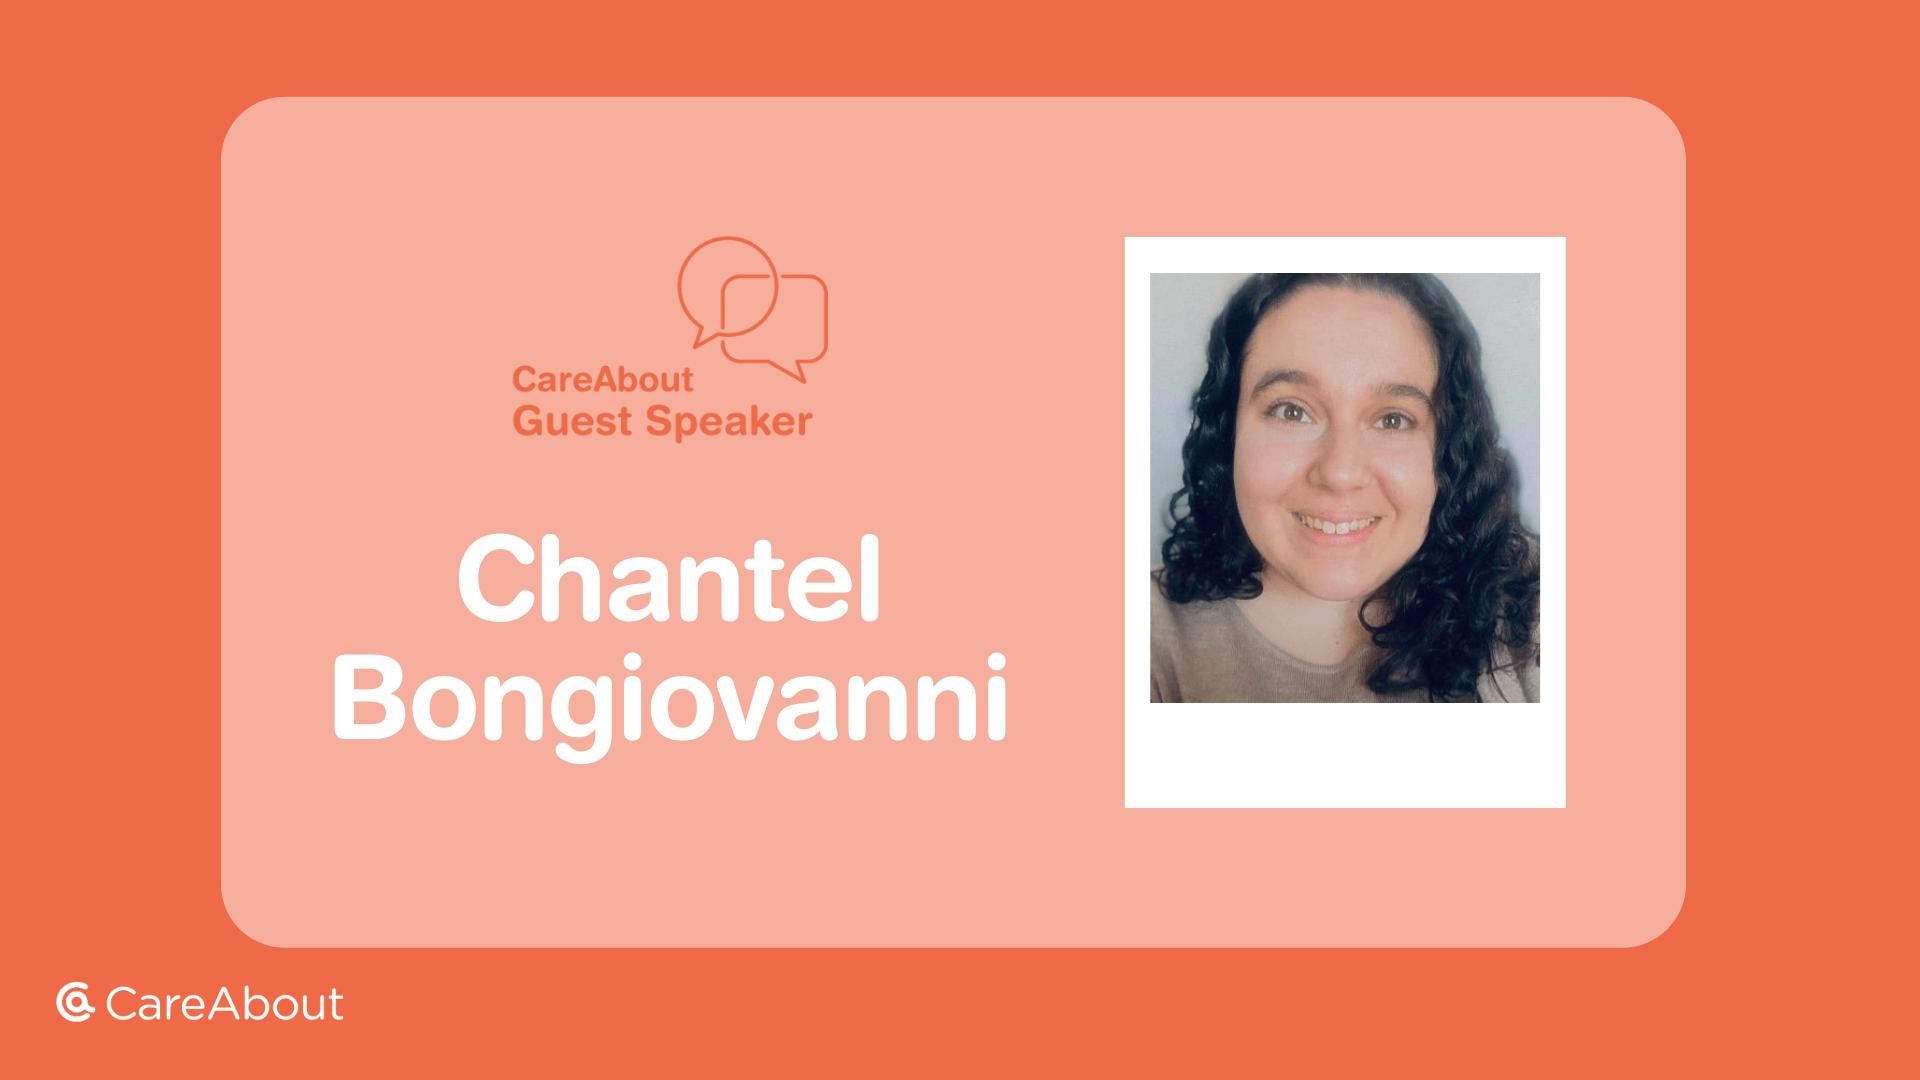 Chantel Bongiovanni